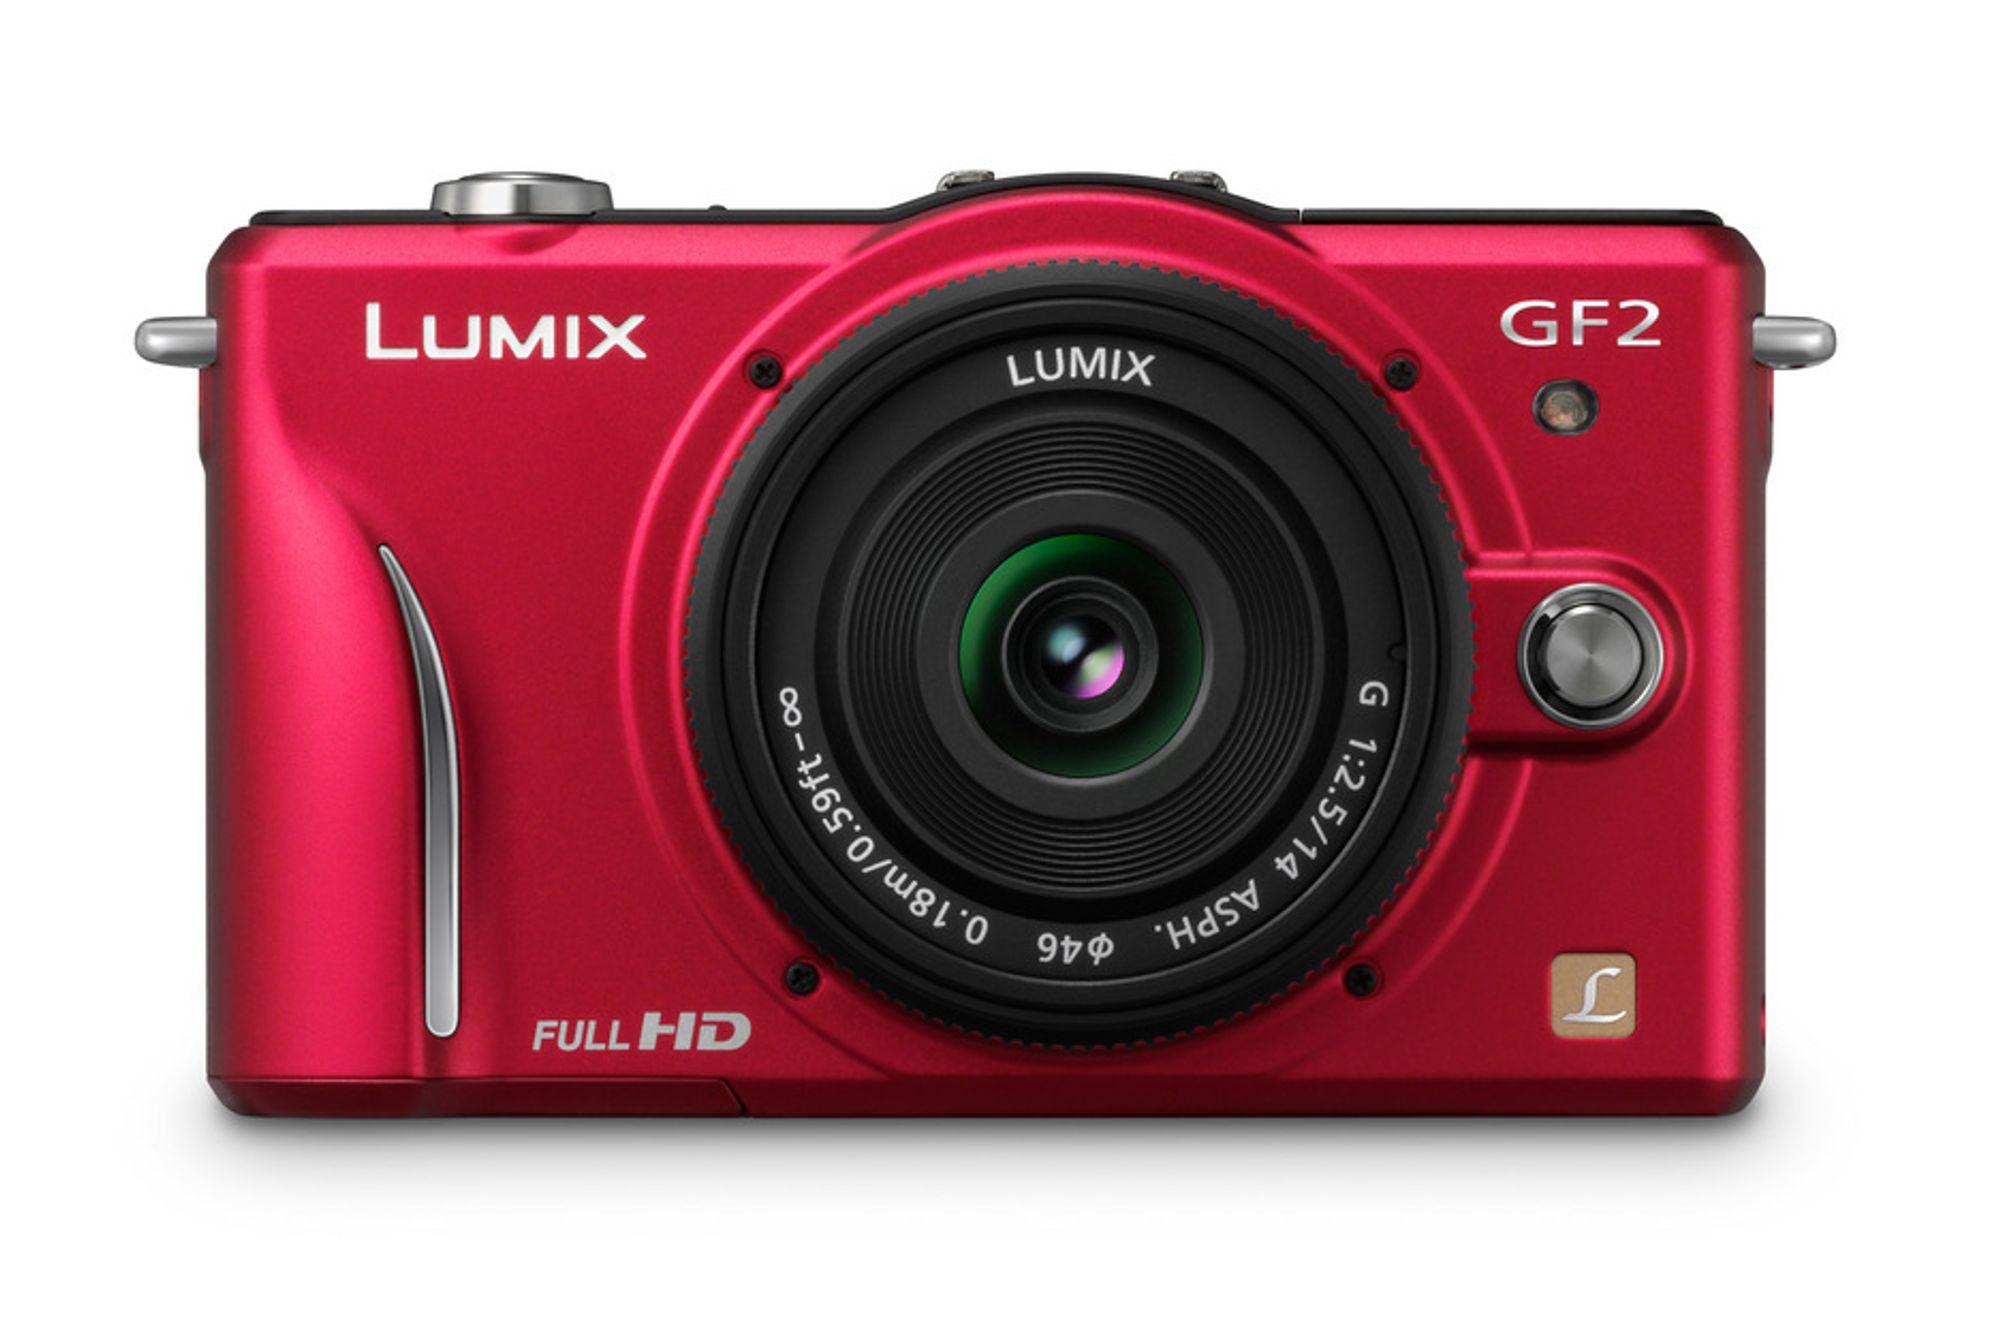 GF2 fås blant annet i rødt.